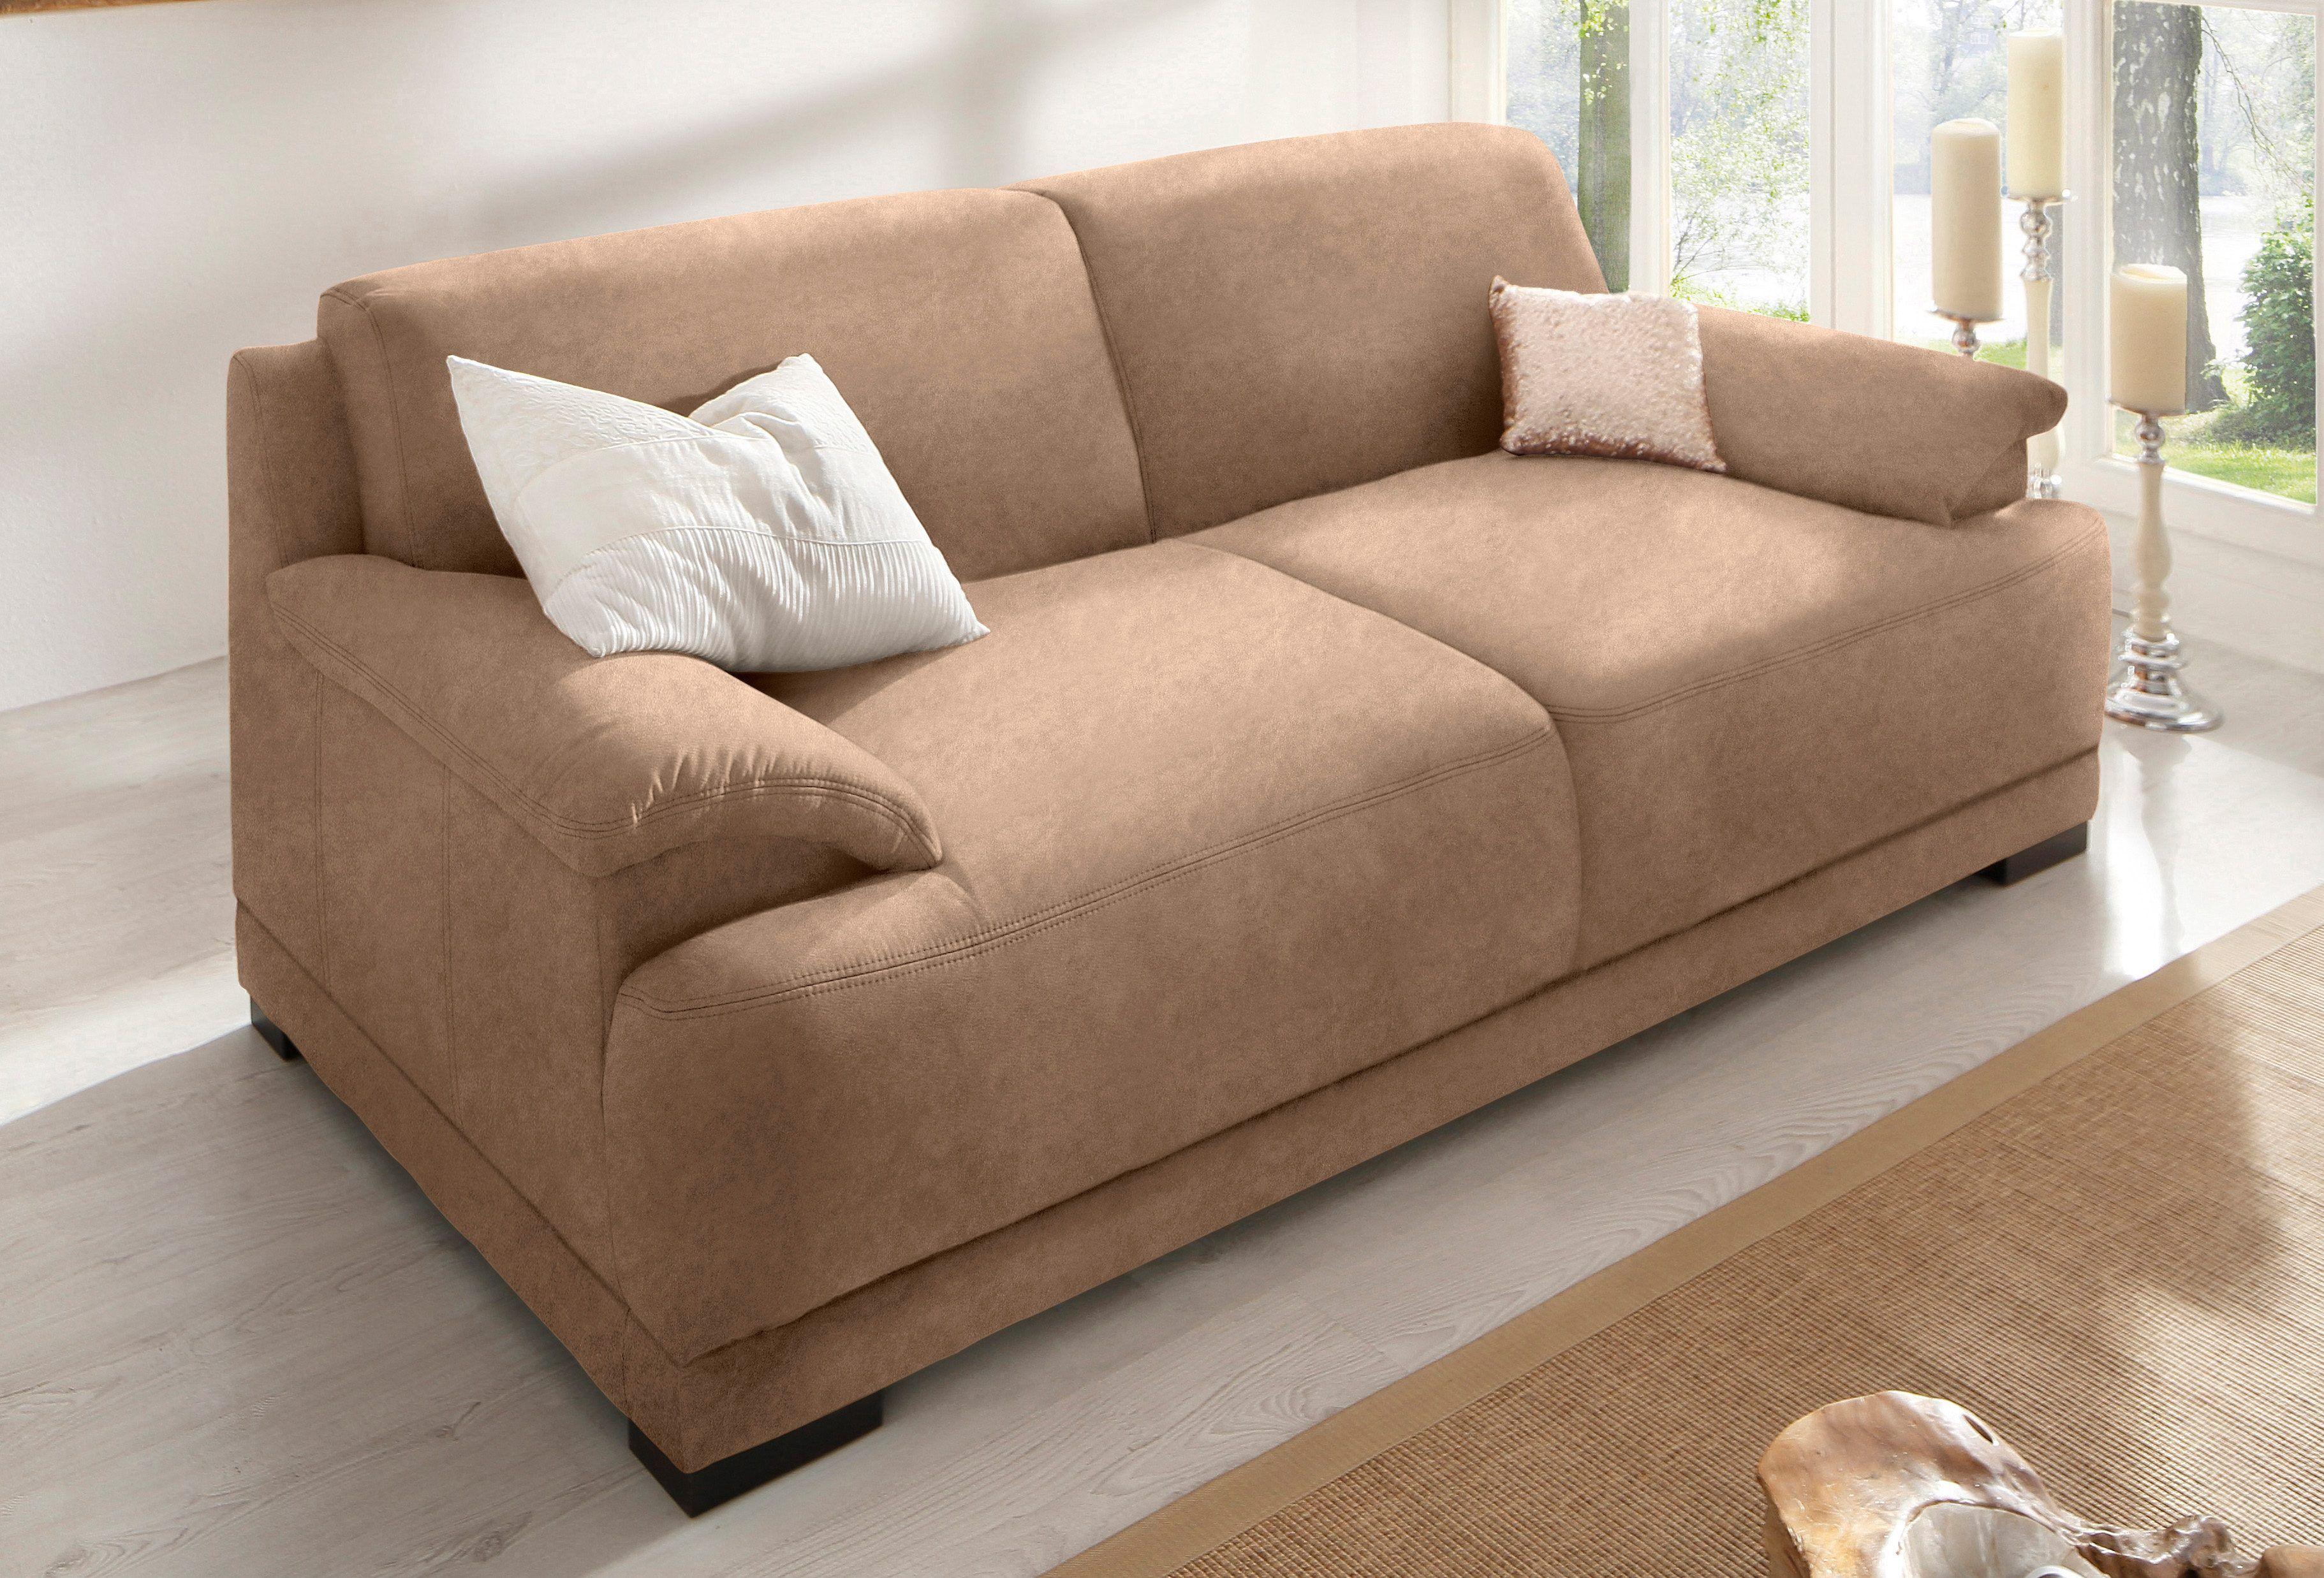 Home Affaire 3 Sitzer Telos In 2020 Haus 3 Sitzer Sofa Sofas